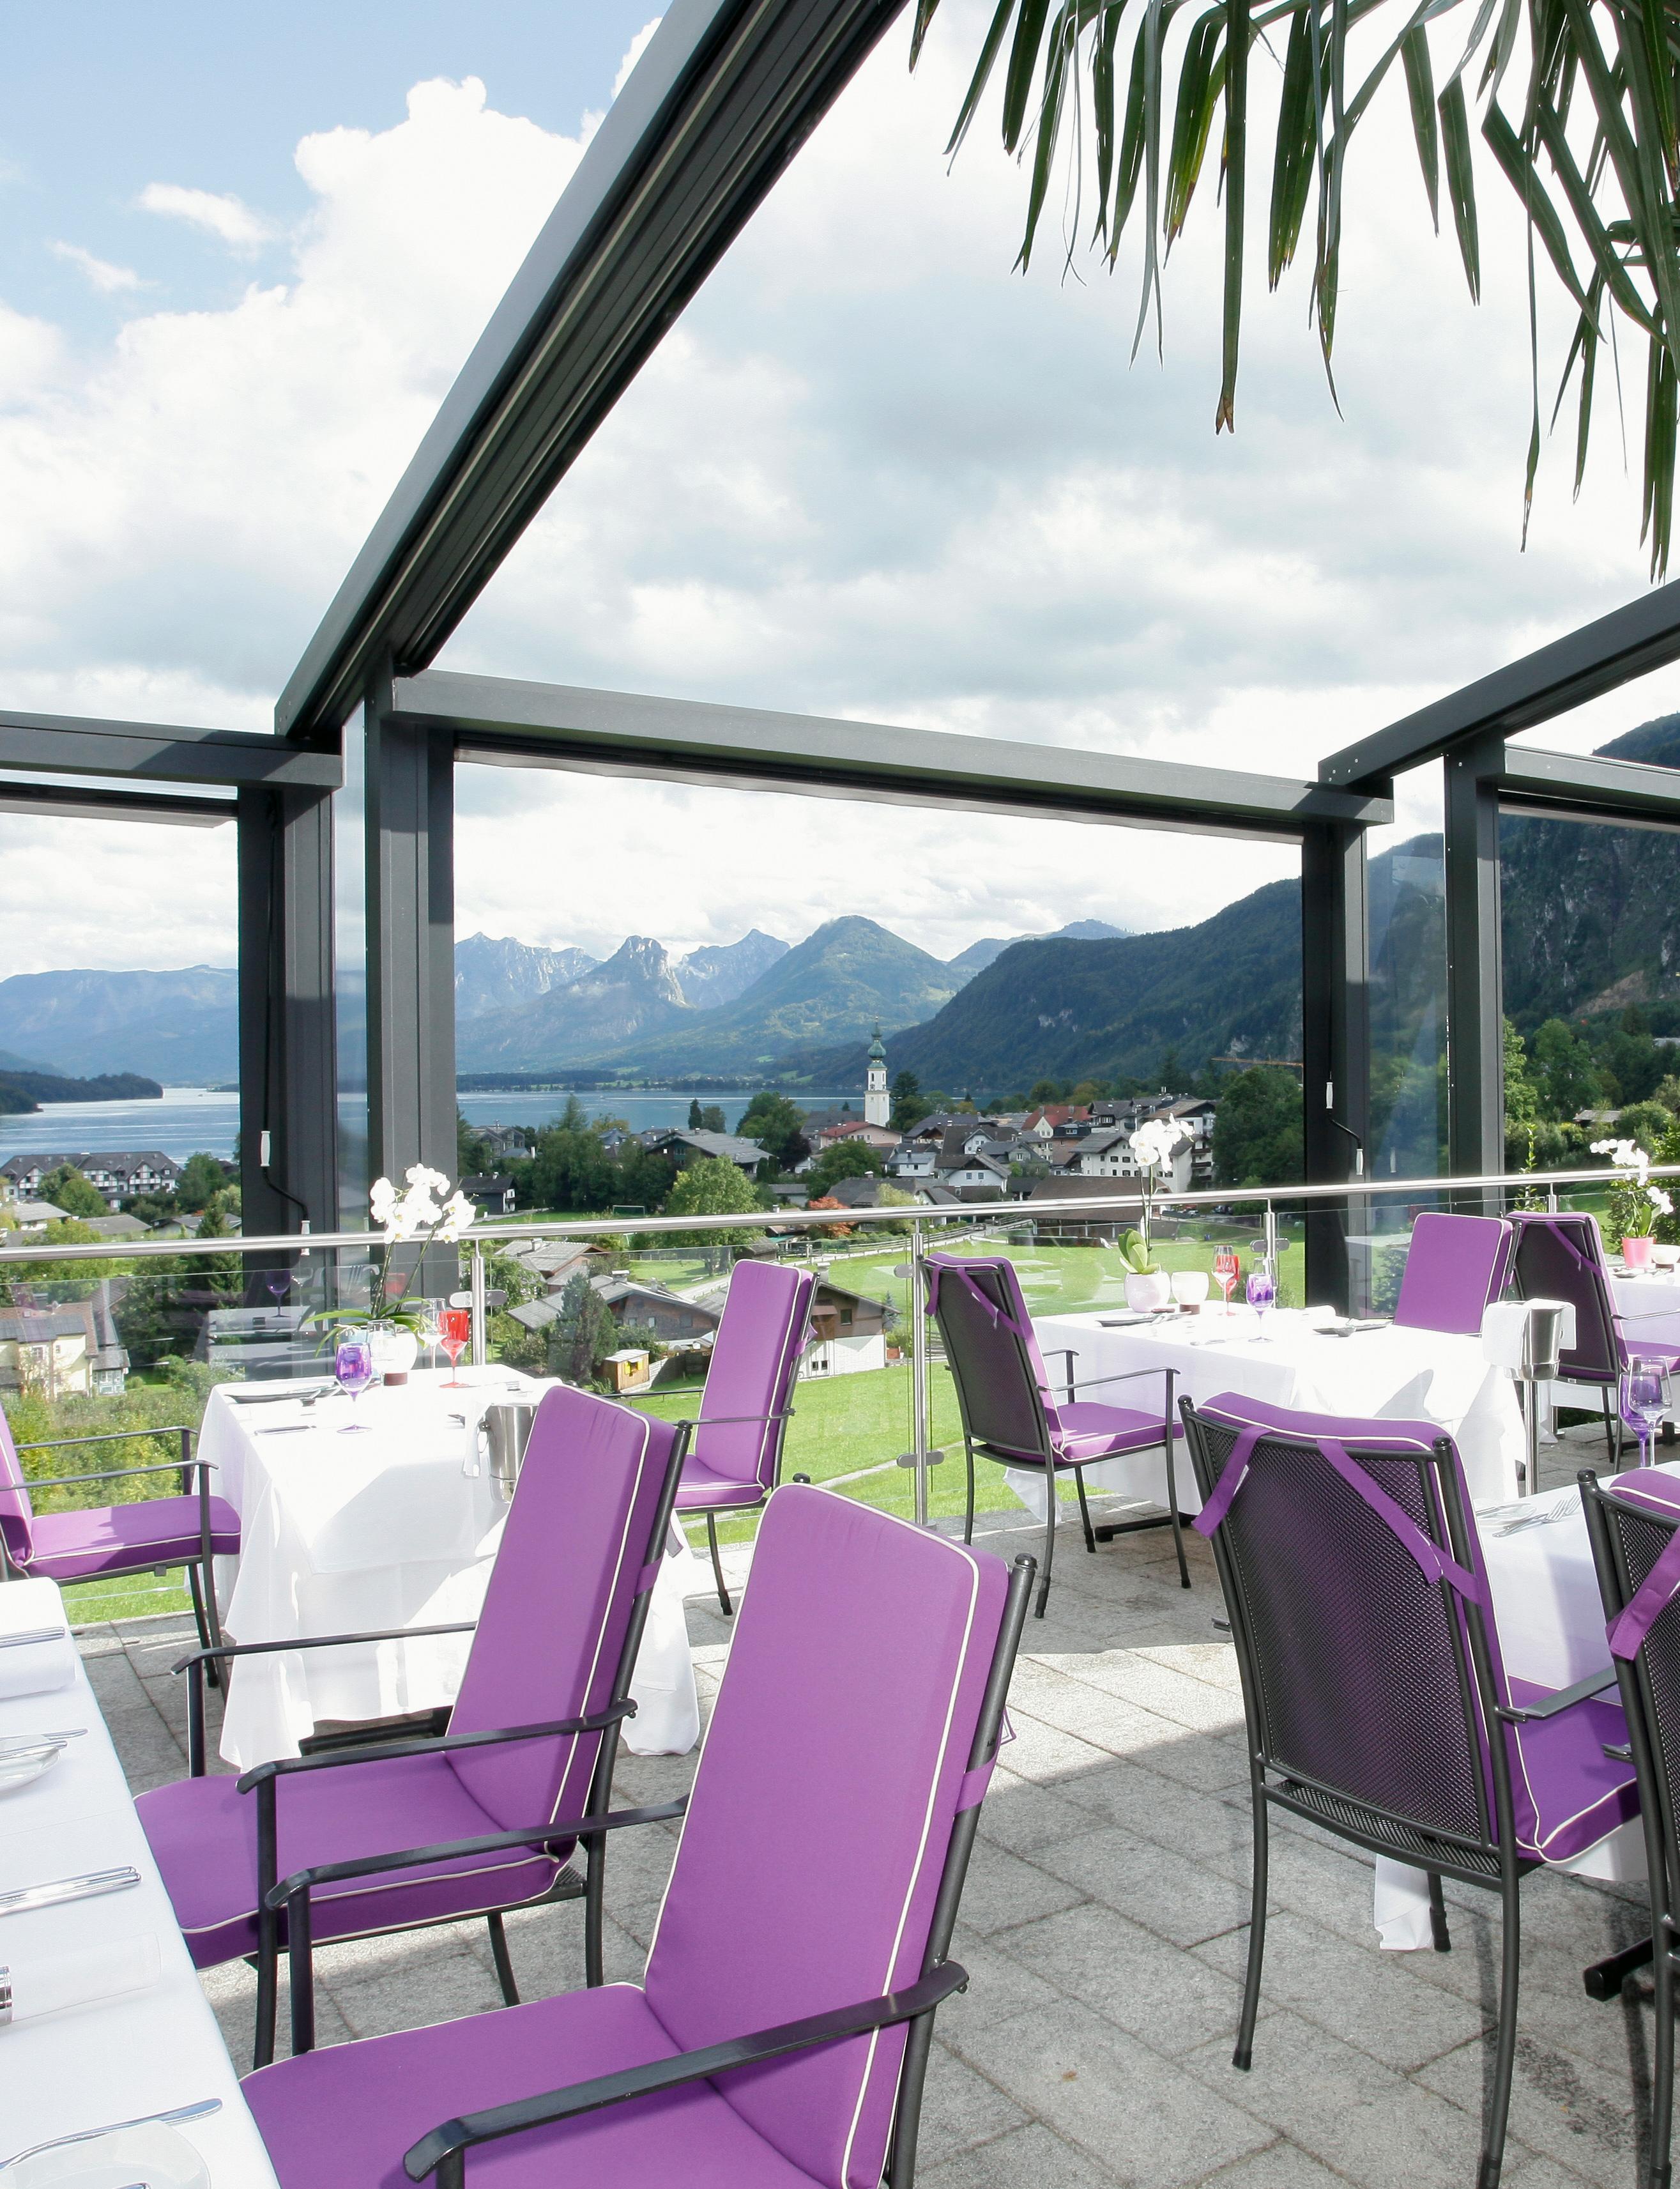 Haus am Hang – Restaurant Haus an Hang in St Gilgen